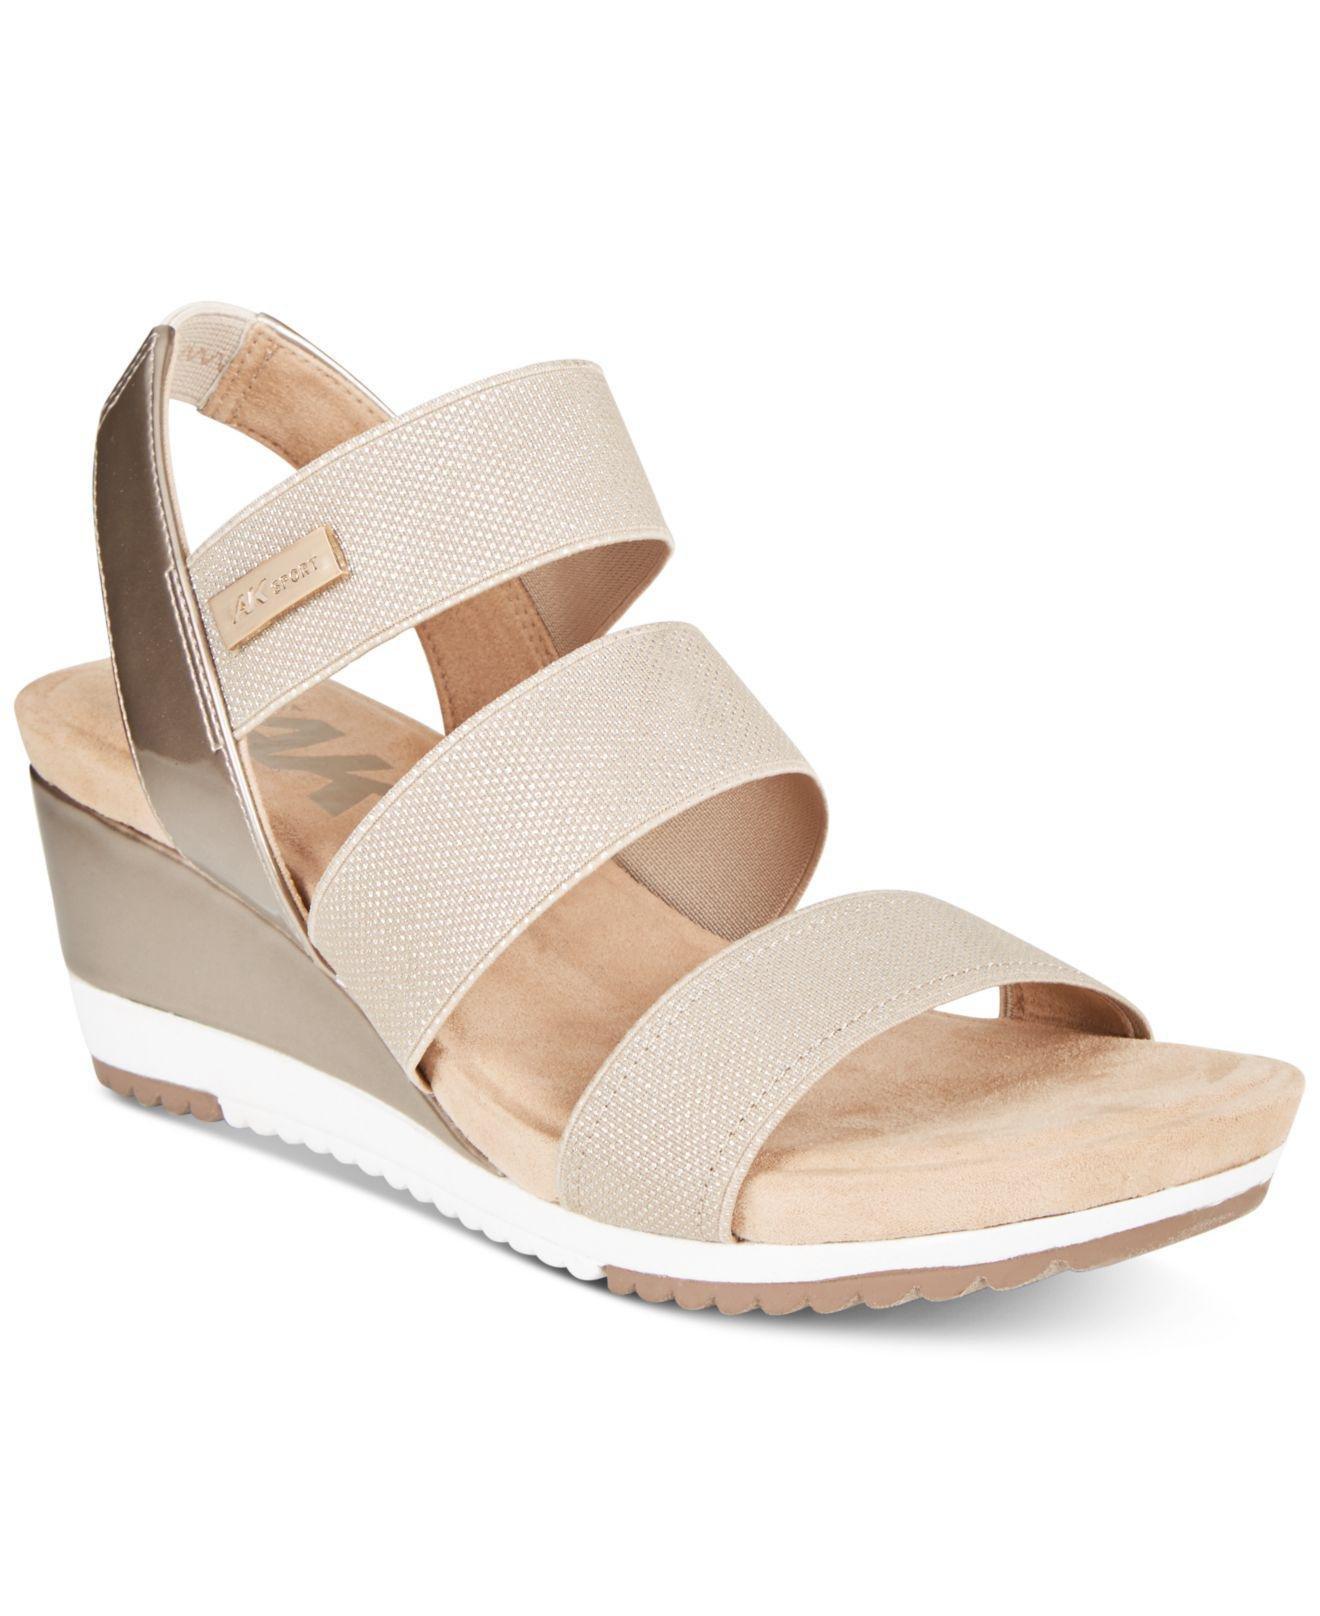 813dc8255ed Lyst - Anne Klein Summertime Wedge Sandals in Natural